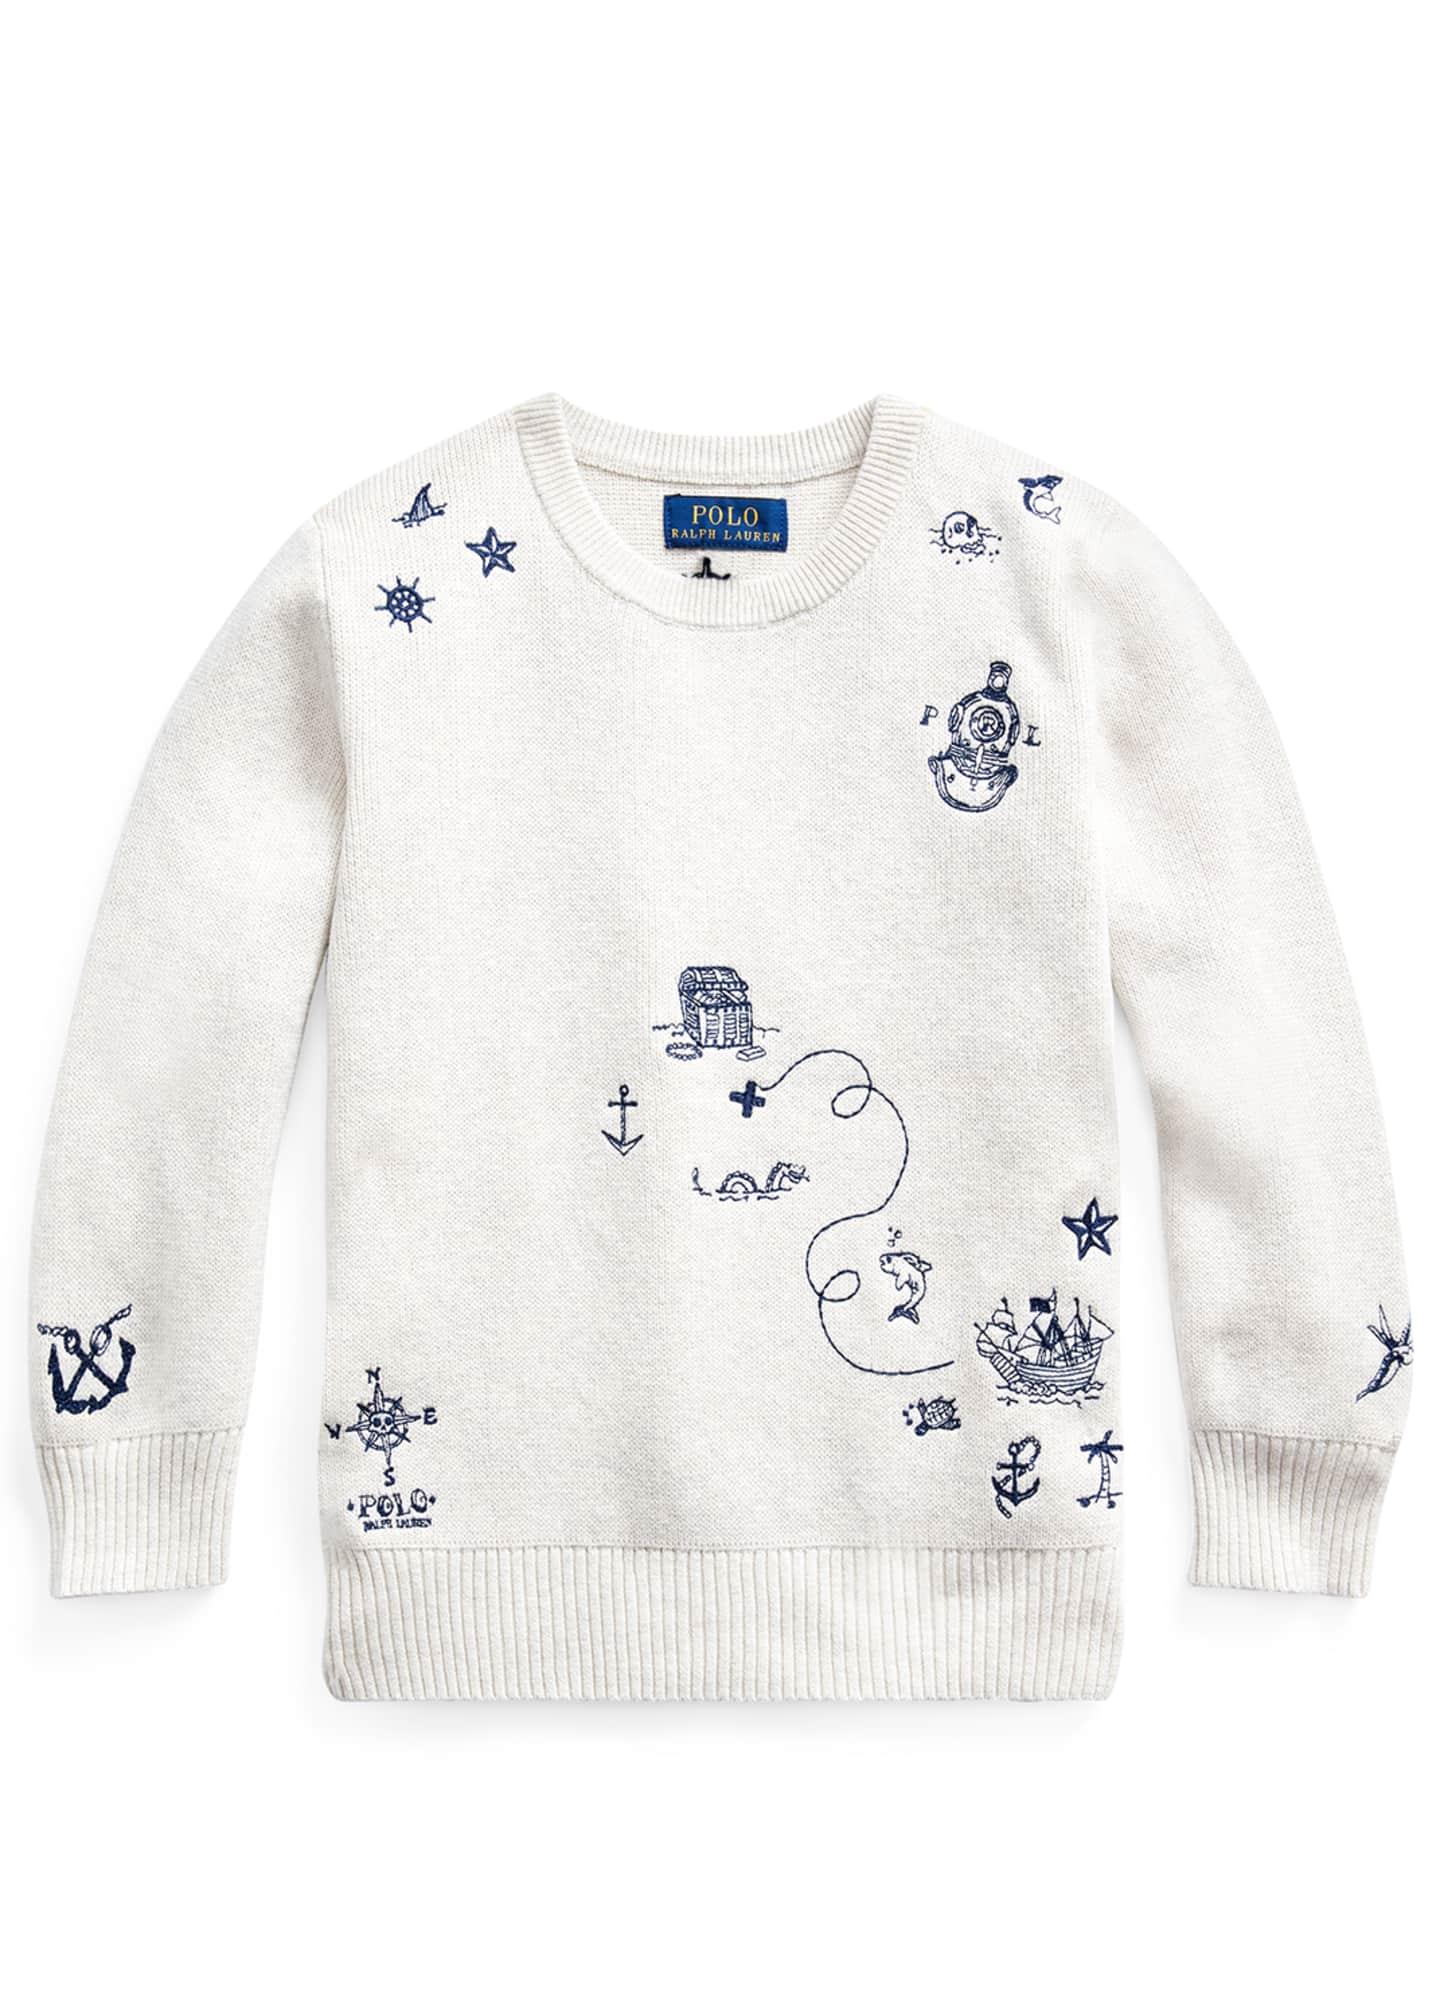 Ralph Lauren Childrenswear Boy's Nautical Embroidered Sweater,